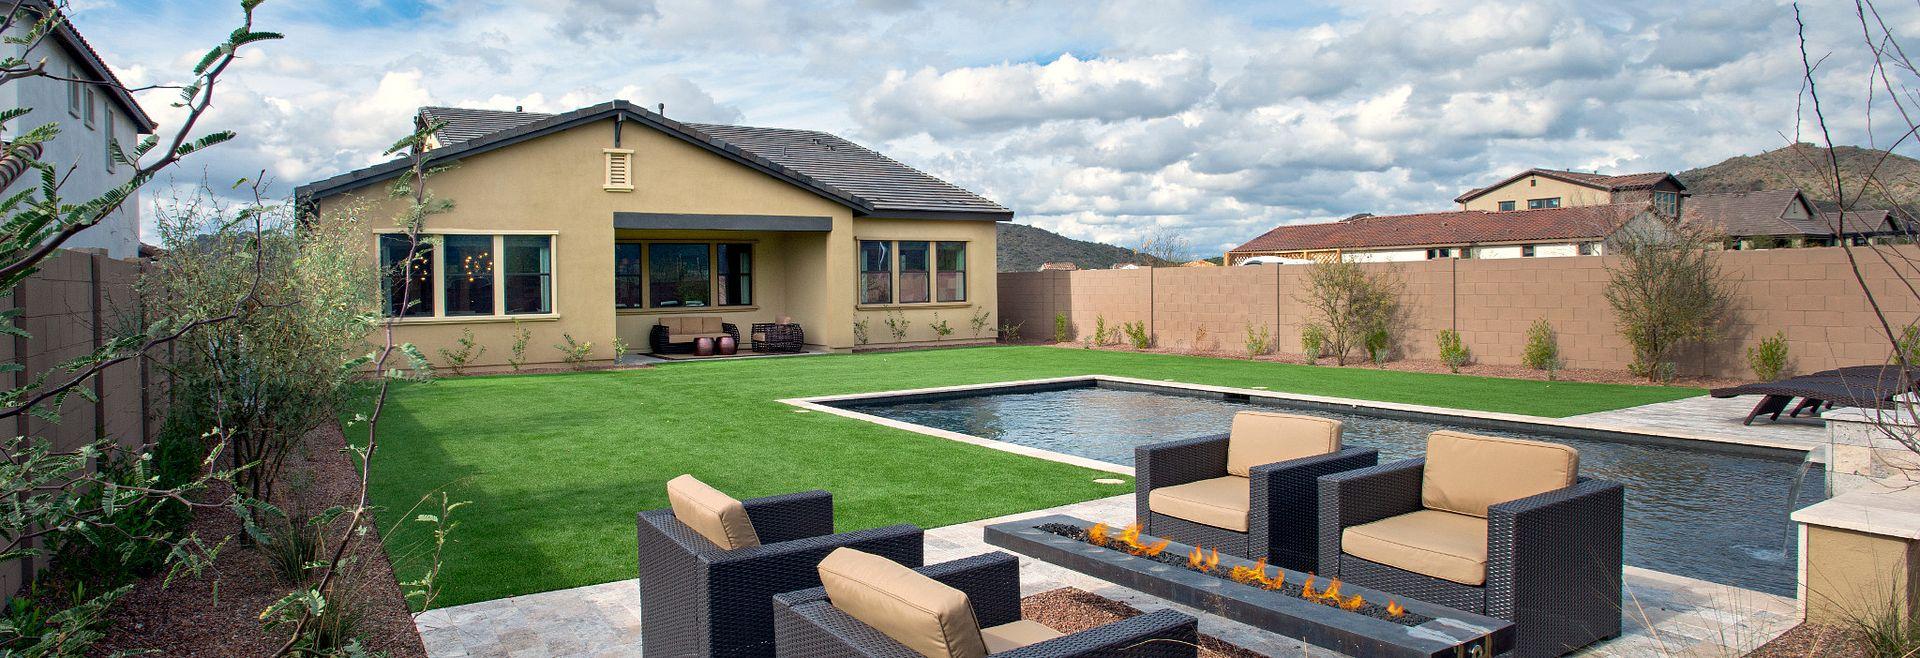 Backyard at Emblem at Aloravita in Peoria, AZ